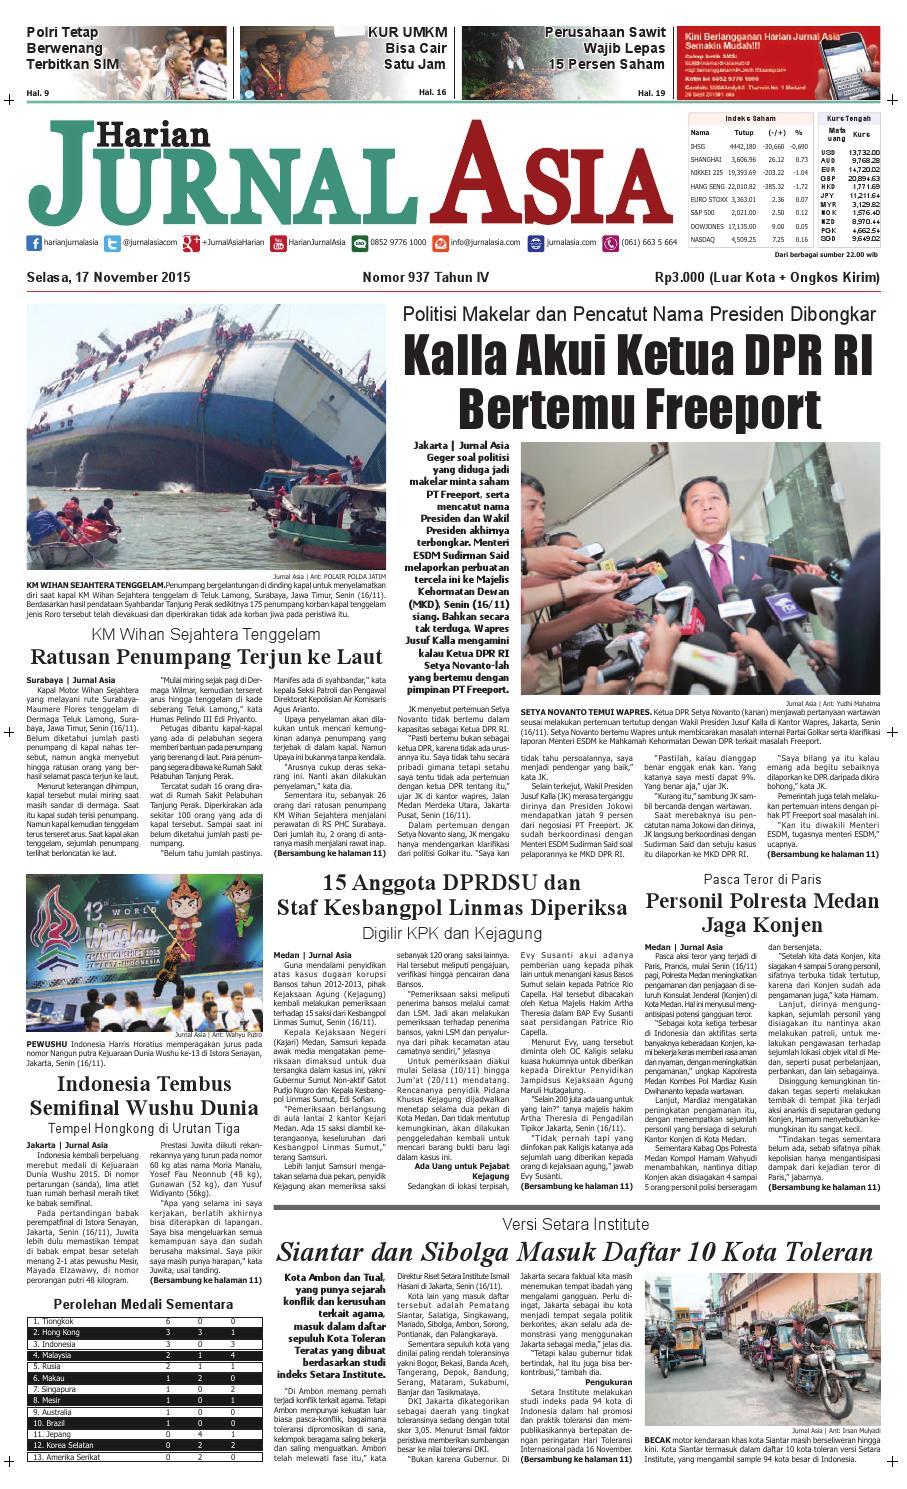 Harian Jurnal Asia Edisi Selasa 17 November 2015 By Produk Ukm Bumn Segi Empat Leopard Medan Issuu